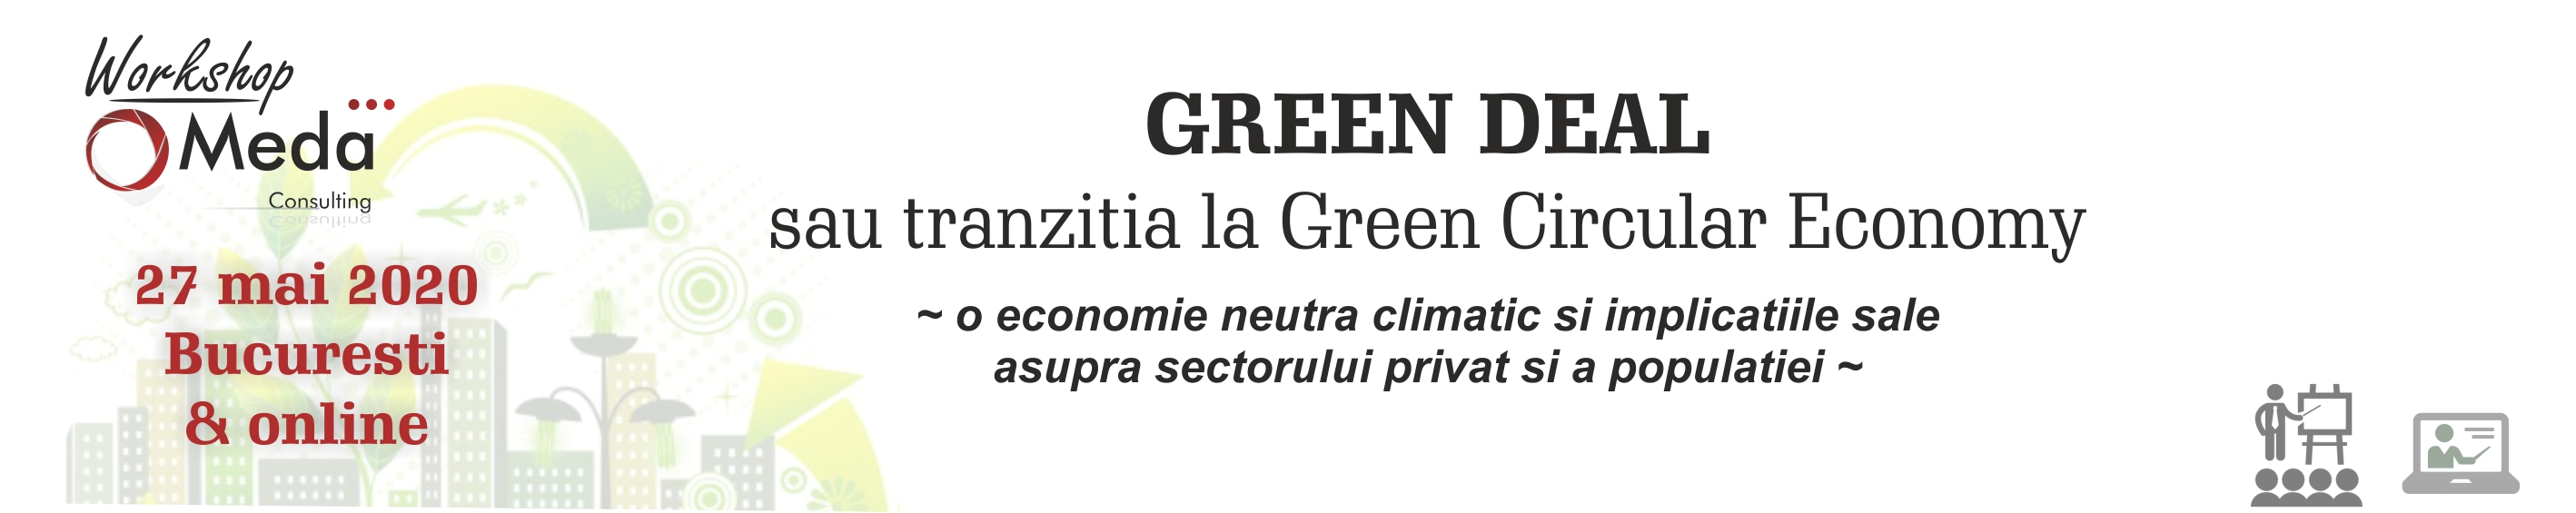 green deal sau tranzitia la green circular economy